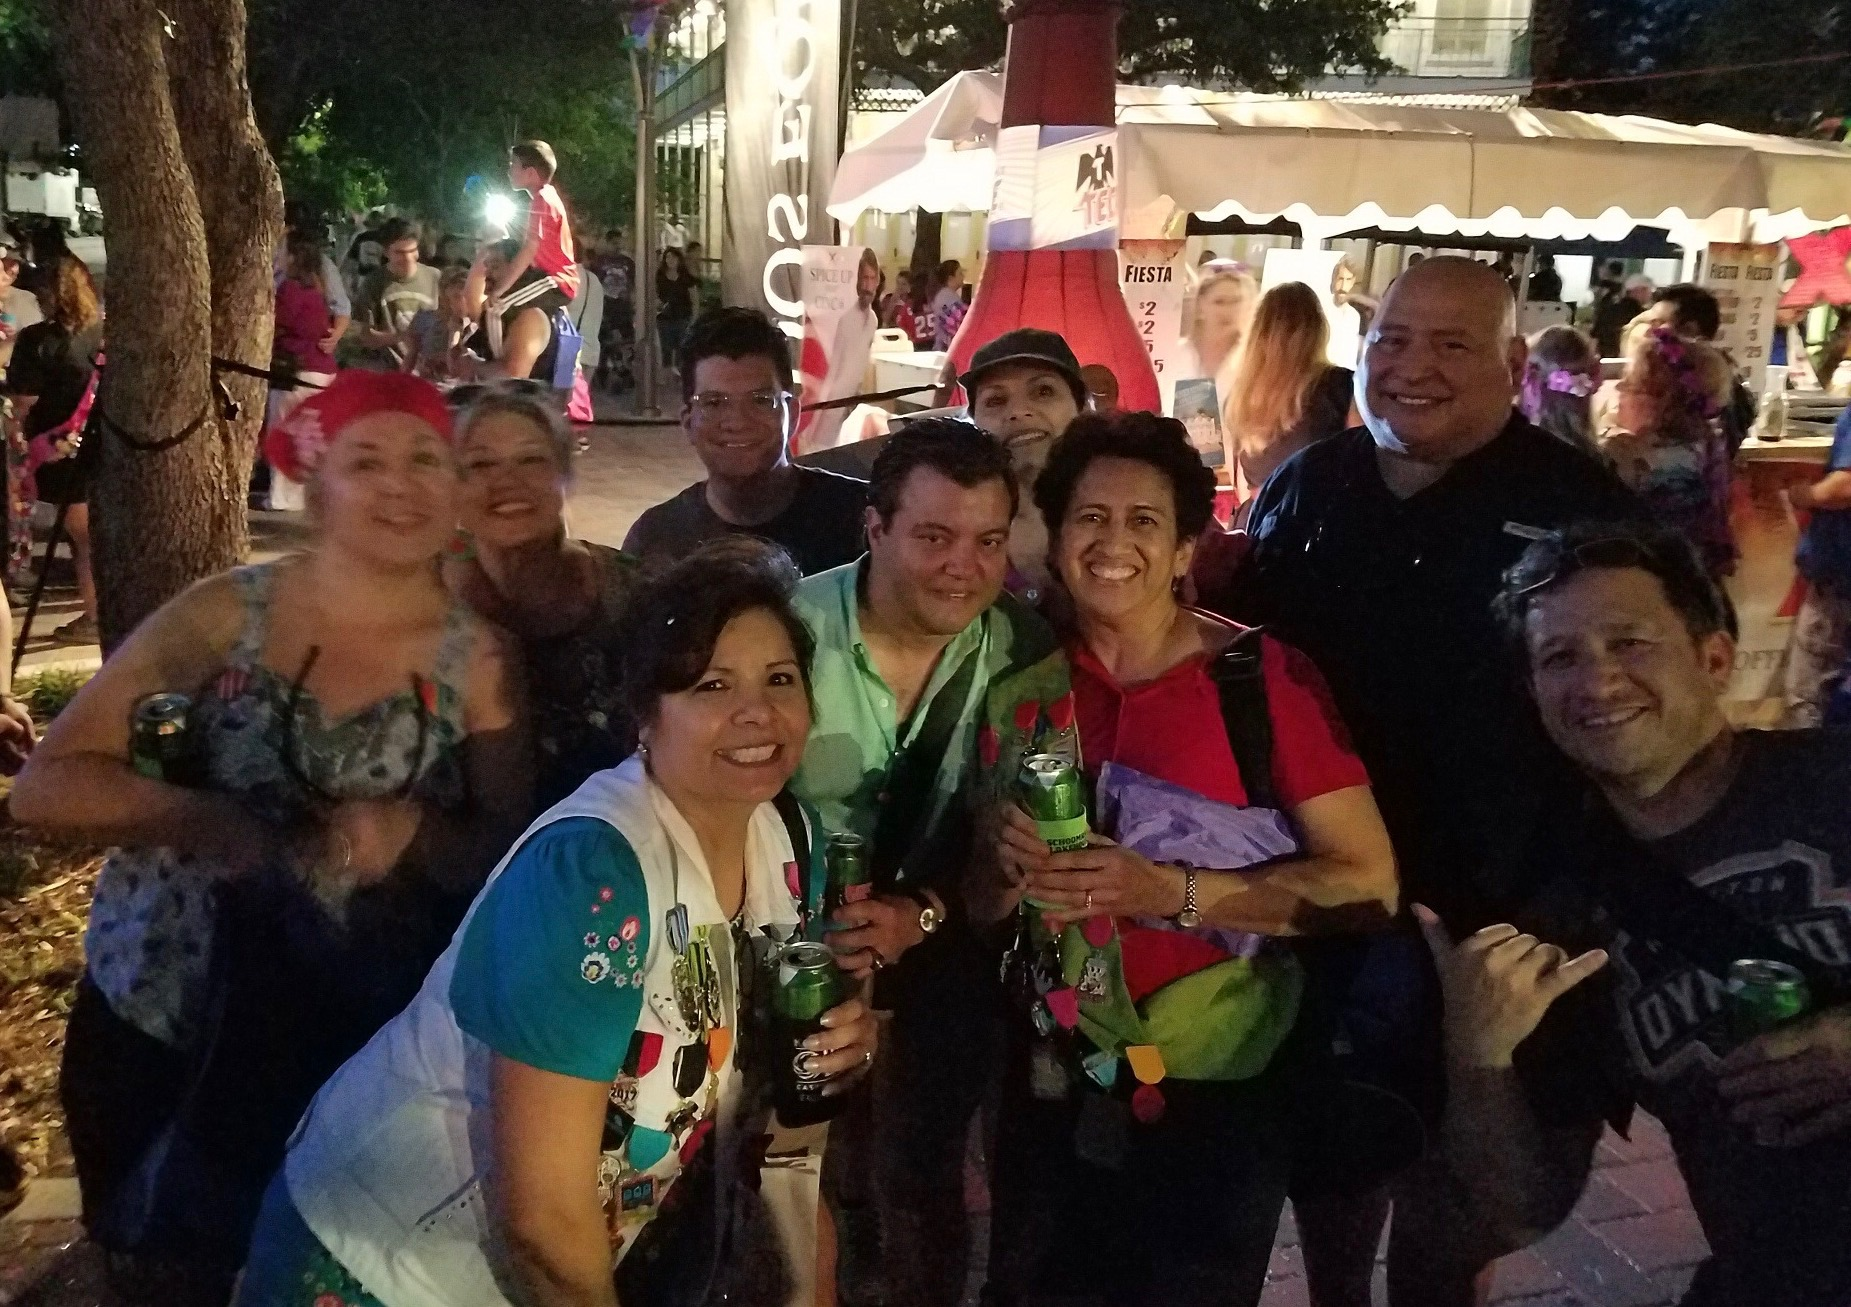 Fiesta with the Winos #thecrazywineladies